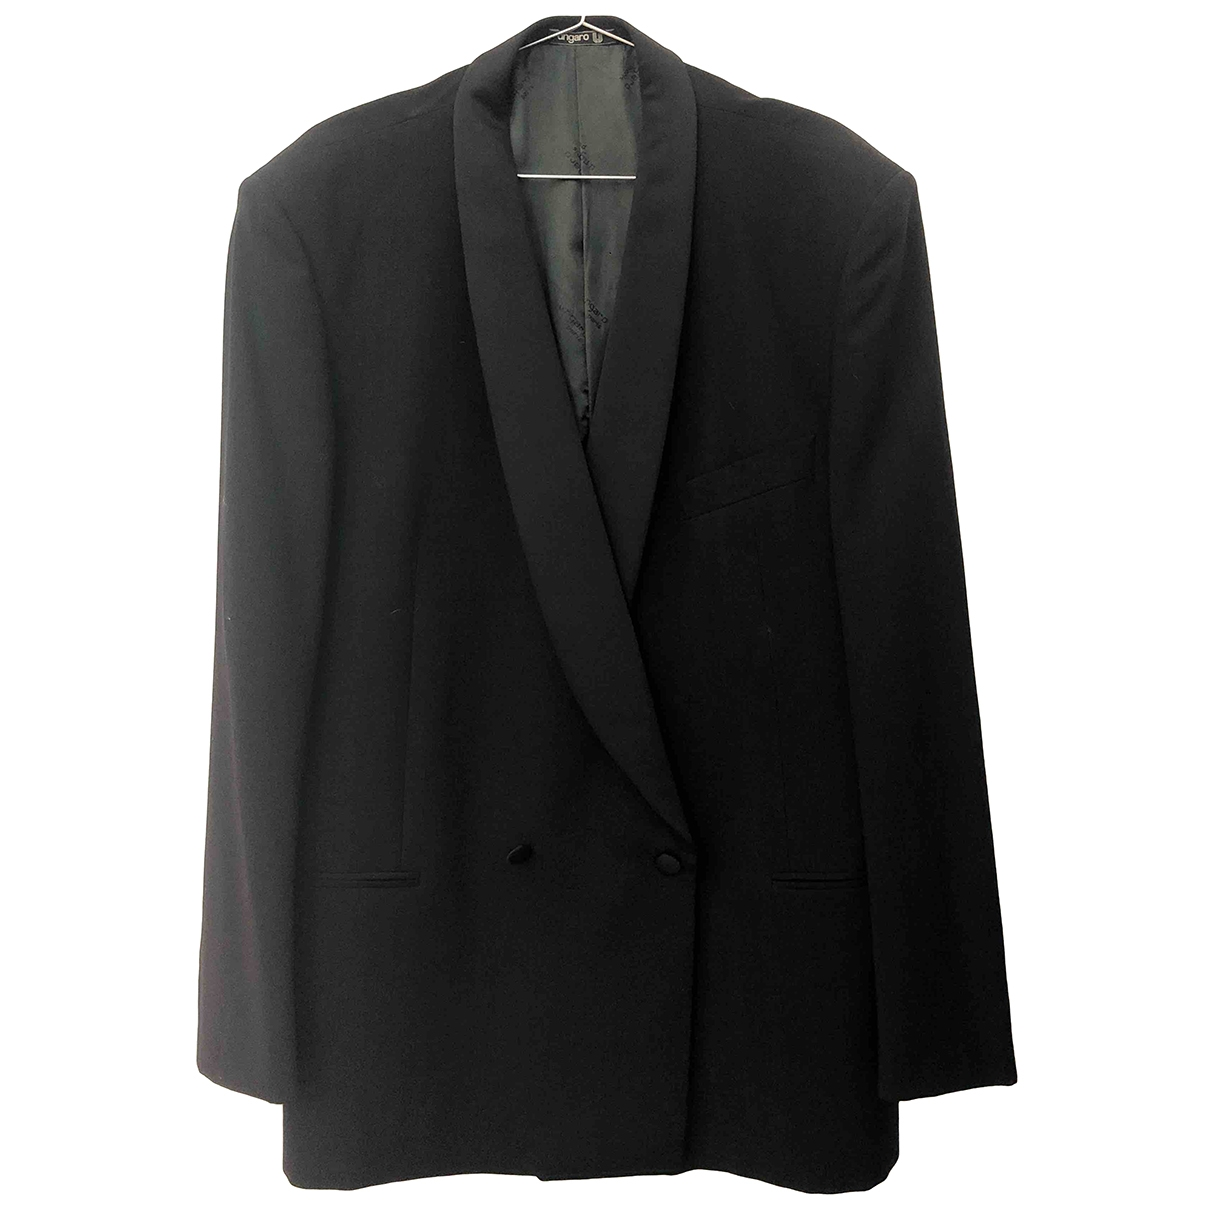 Ungaro Parallele \N Black Wool jacket  for Men 54 IT